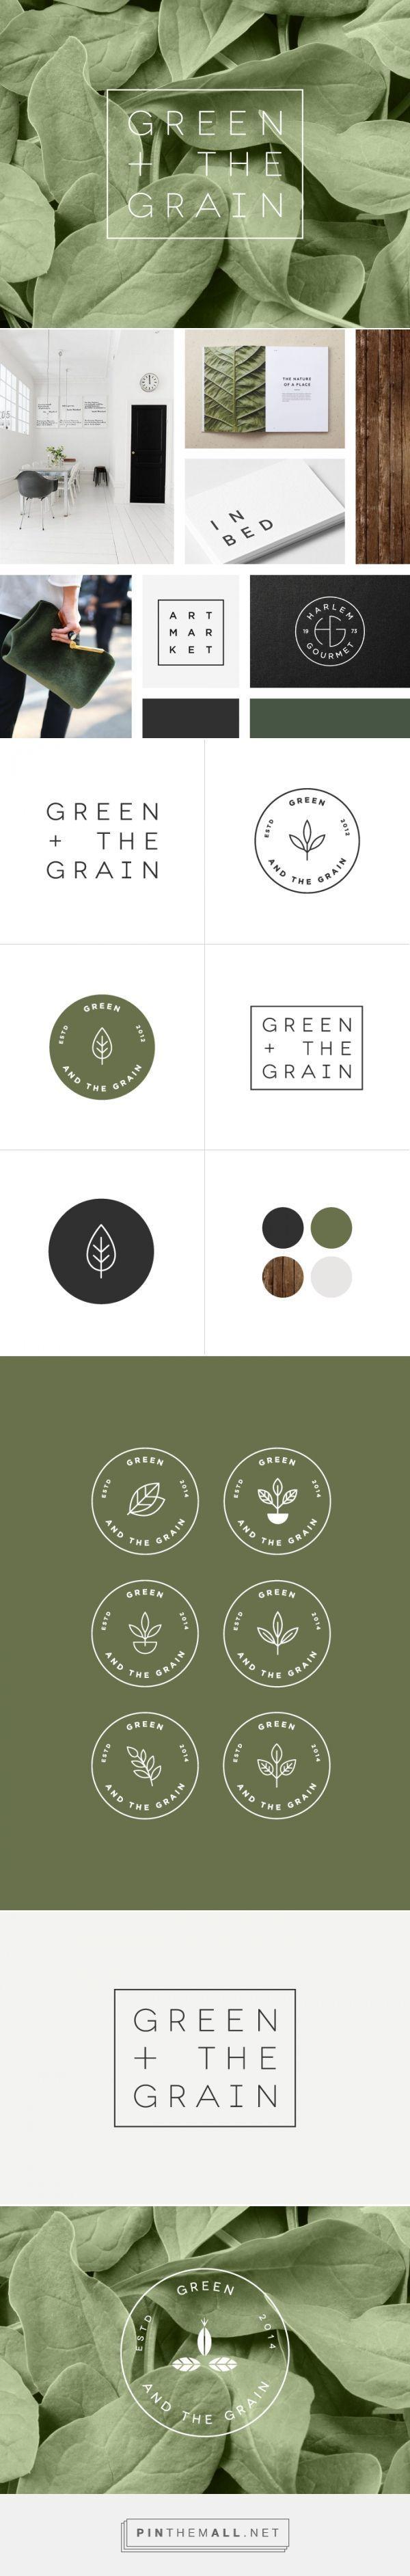 New Work Green & The Grain | Rowan Made {cT}